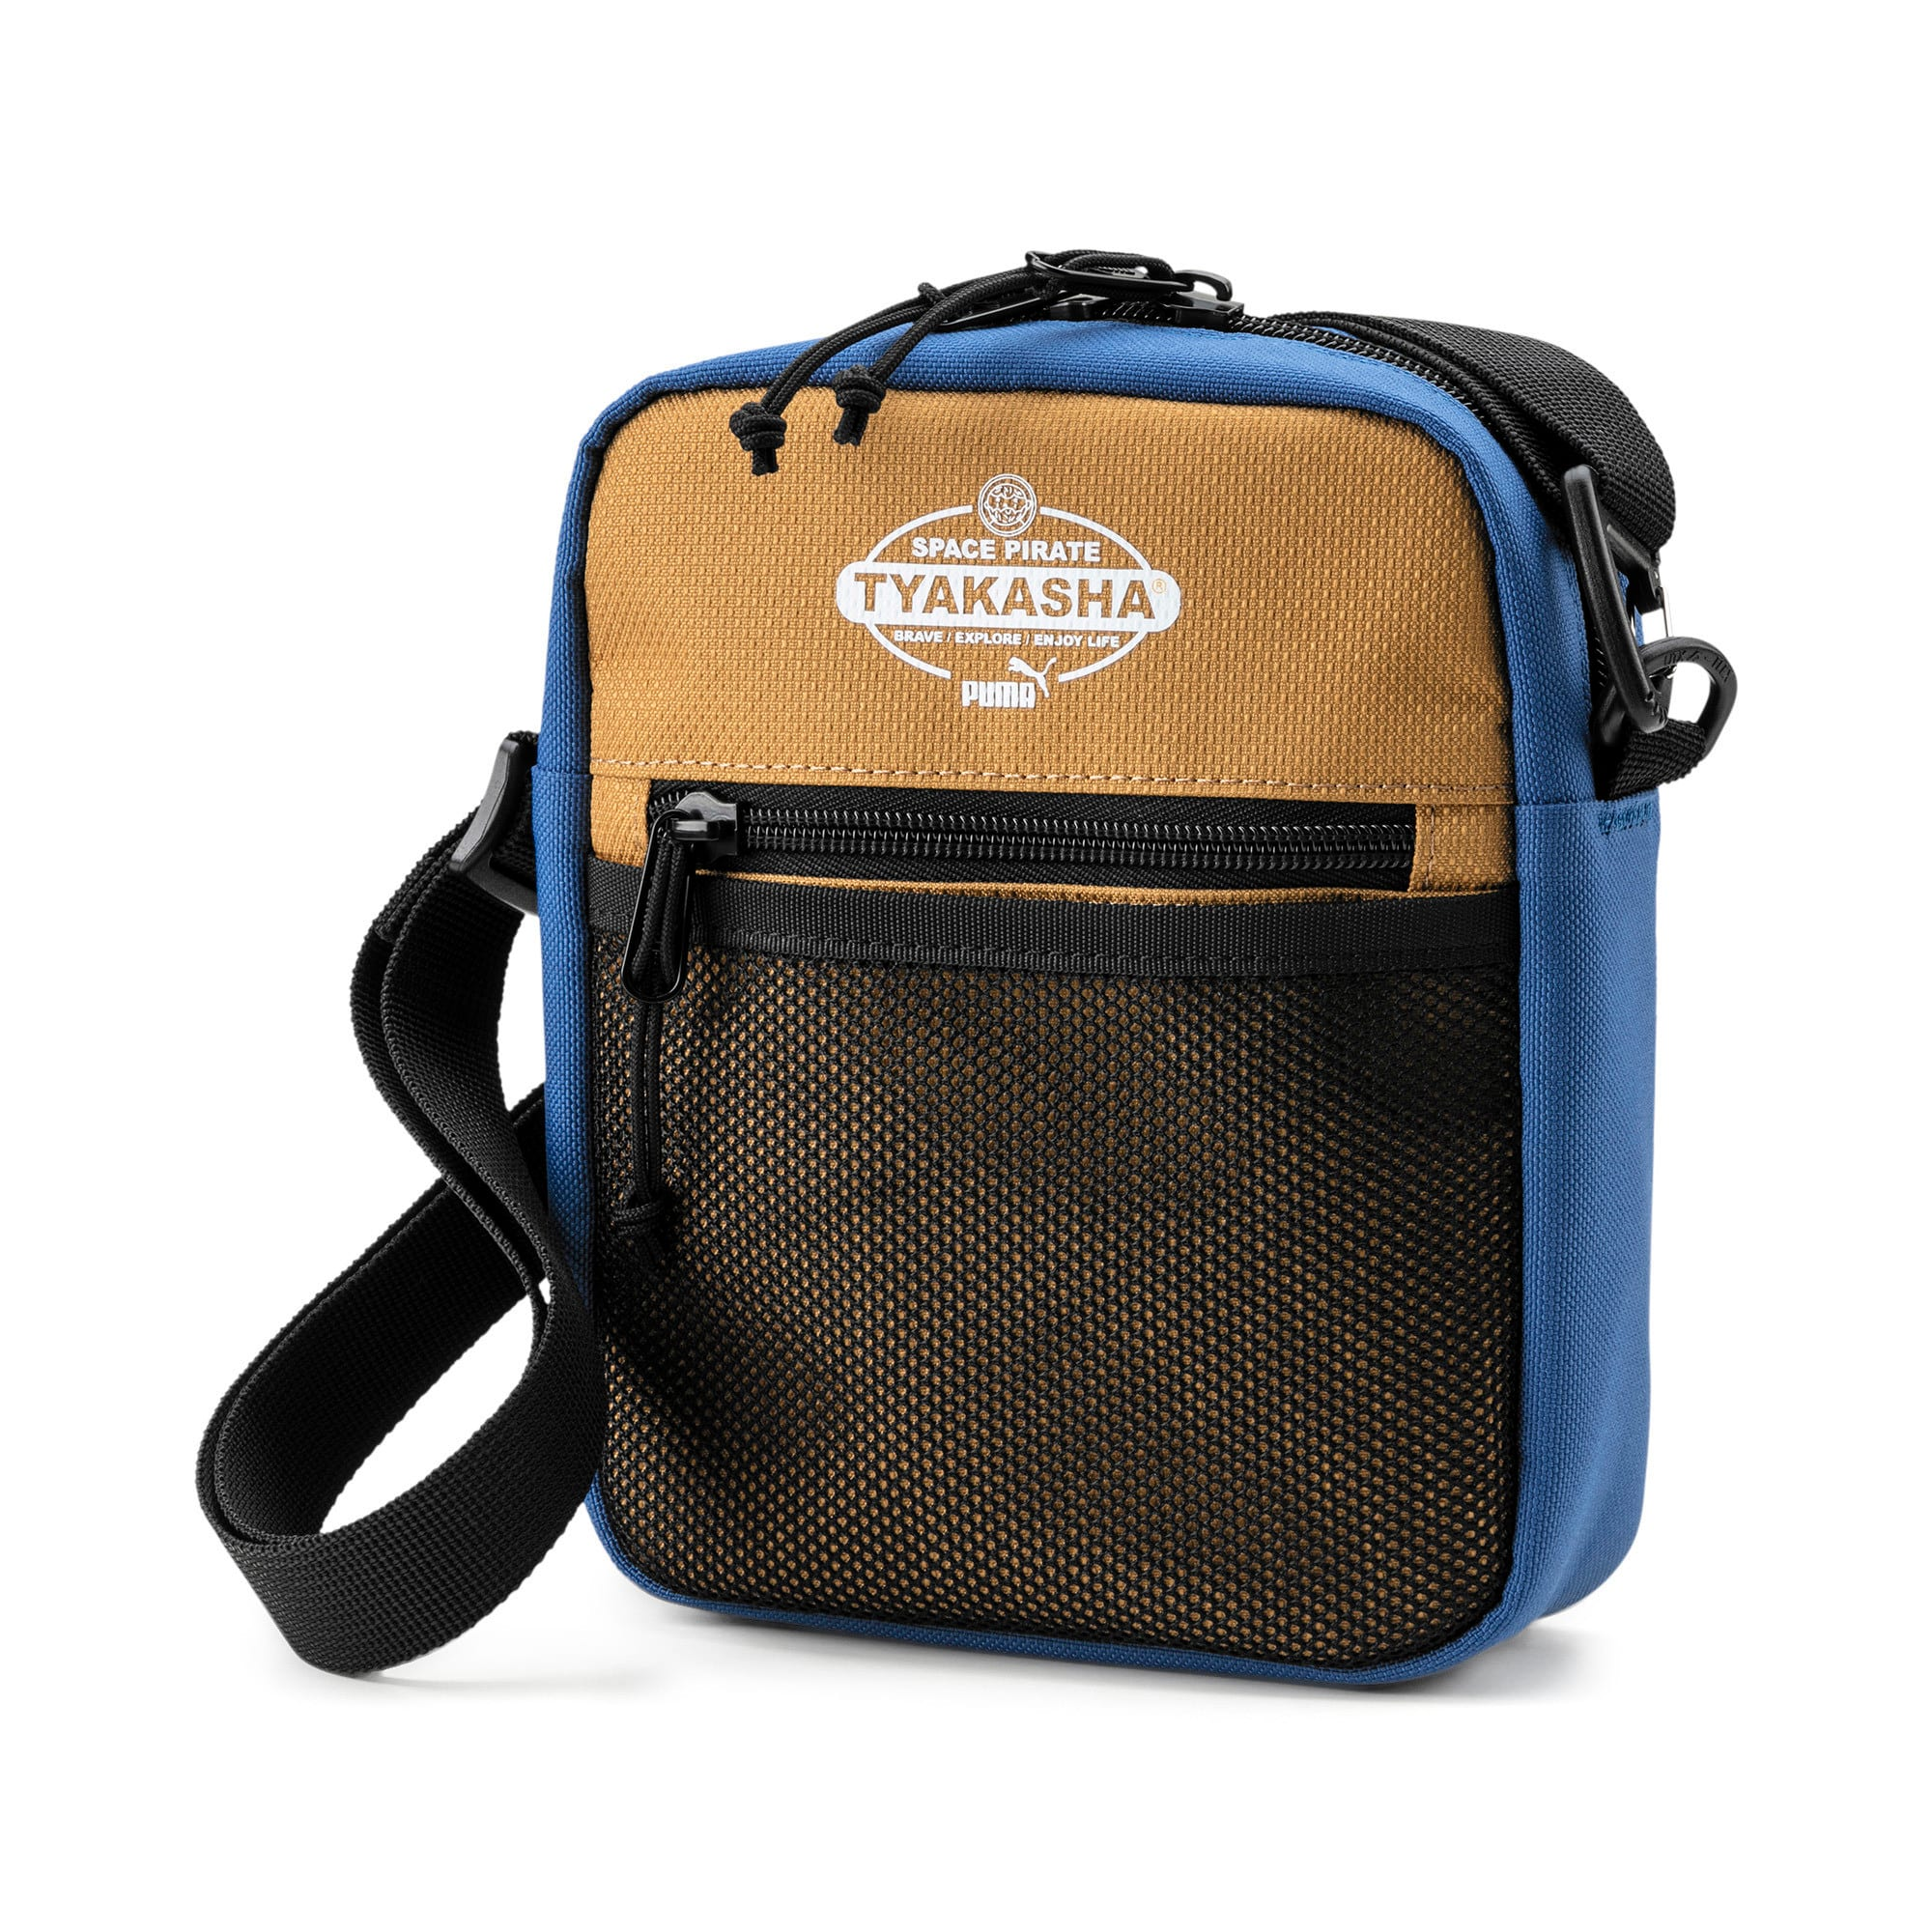 Thumbnail 1 of PUMA x TYAKASHA Crossbody Bag, G.Blue-F.Brick-B.Brown, medium